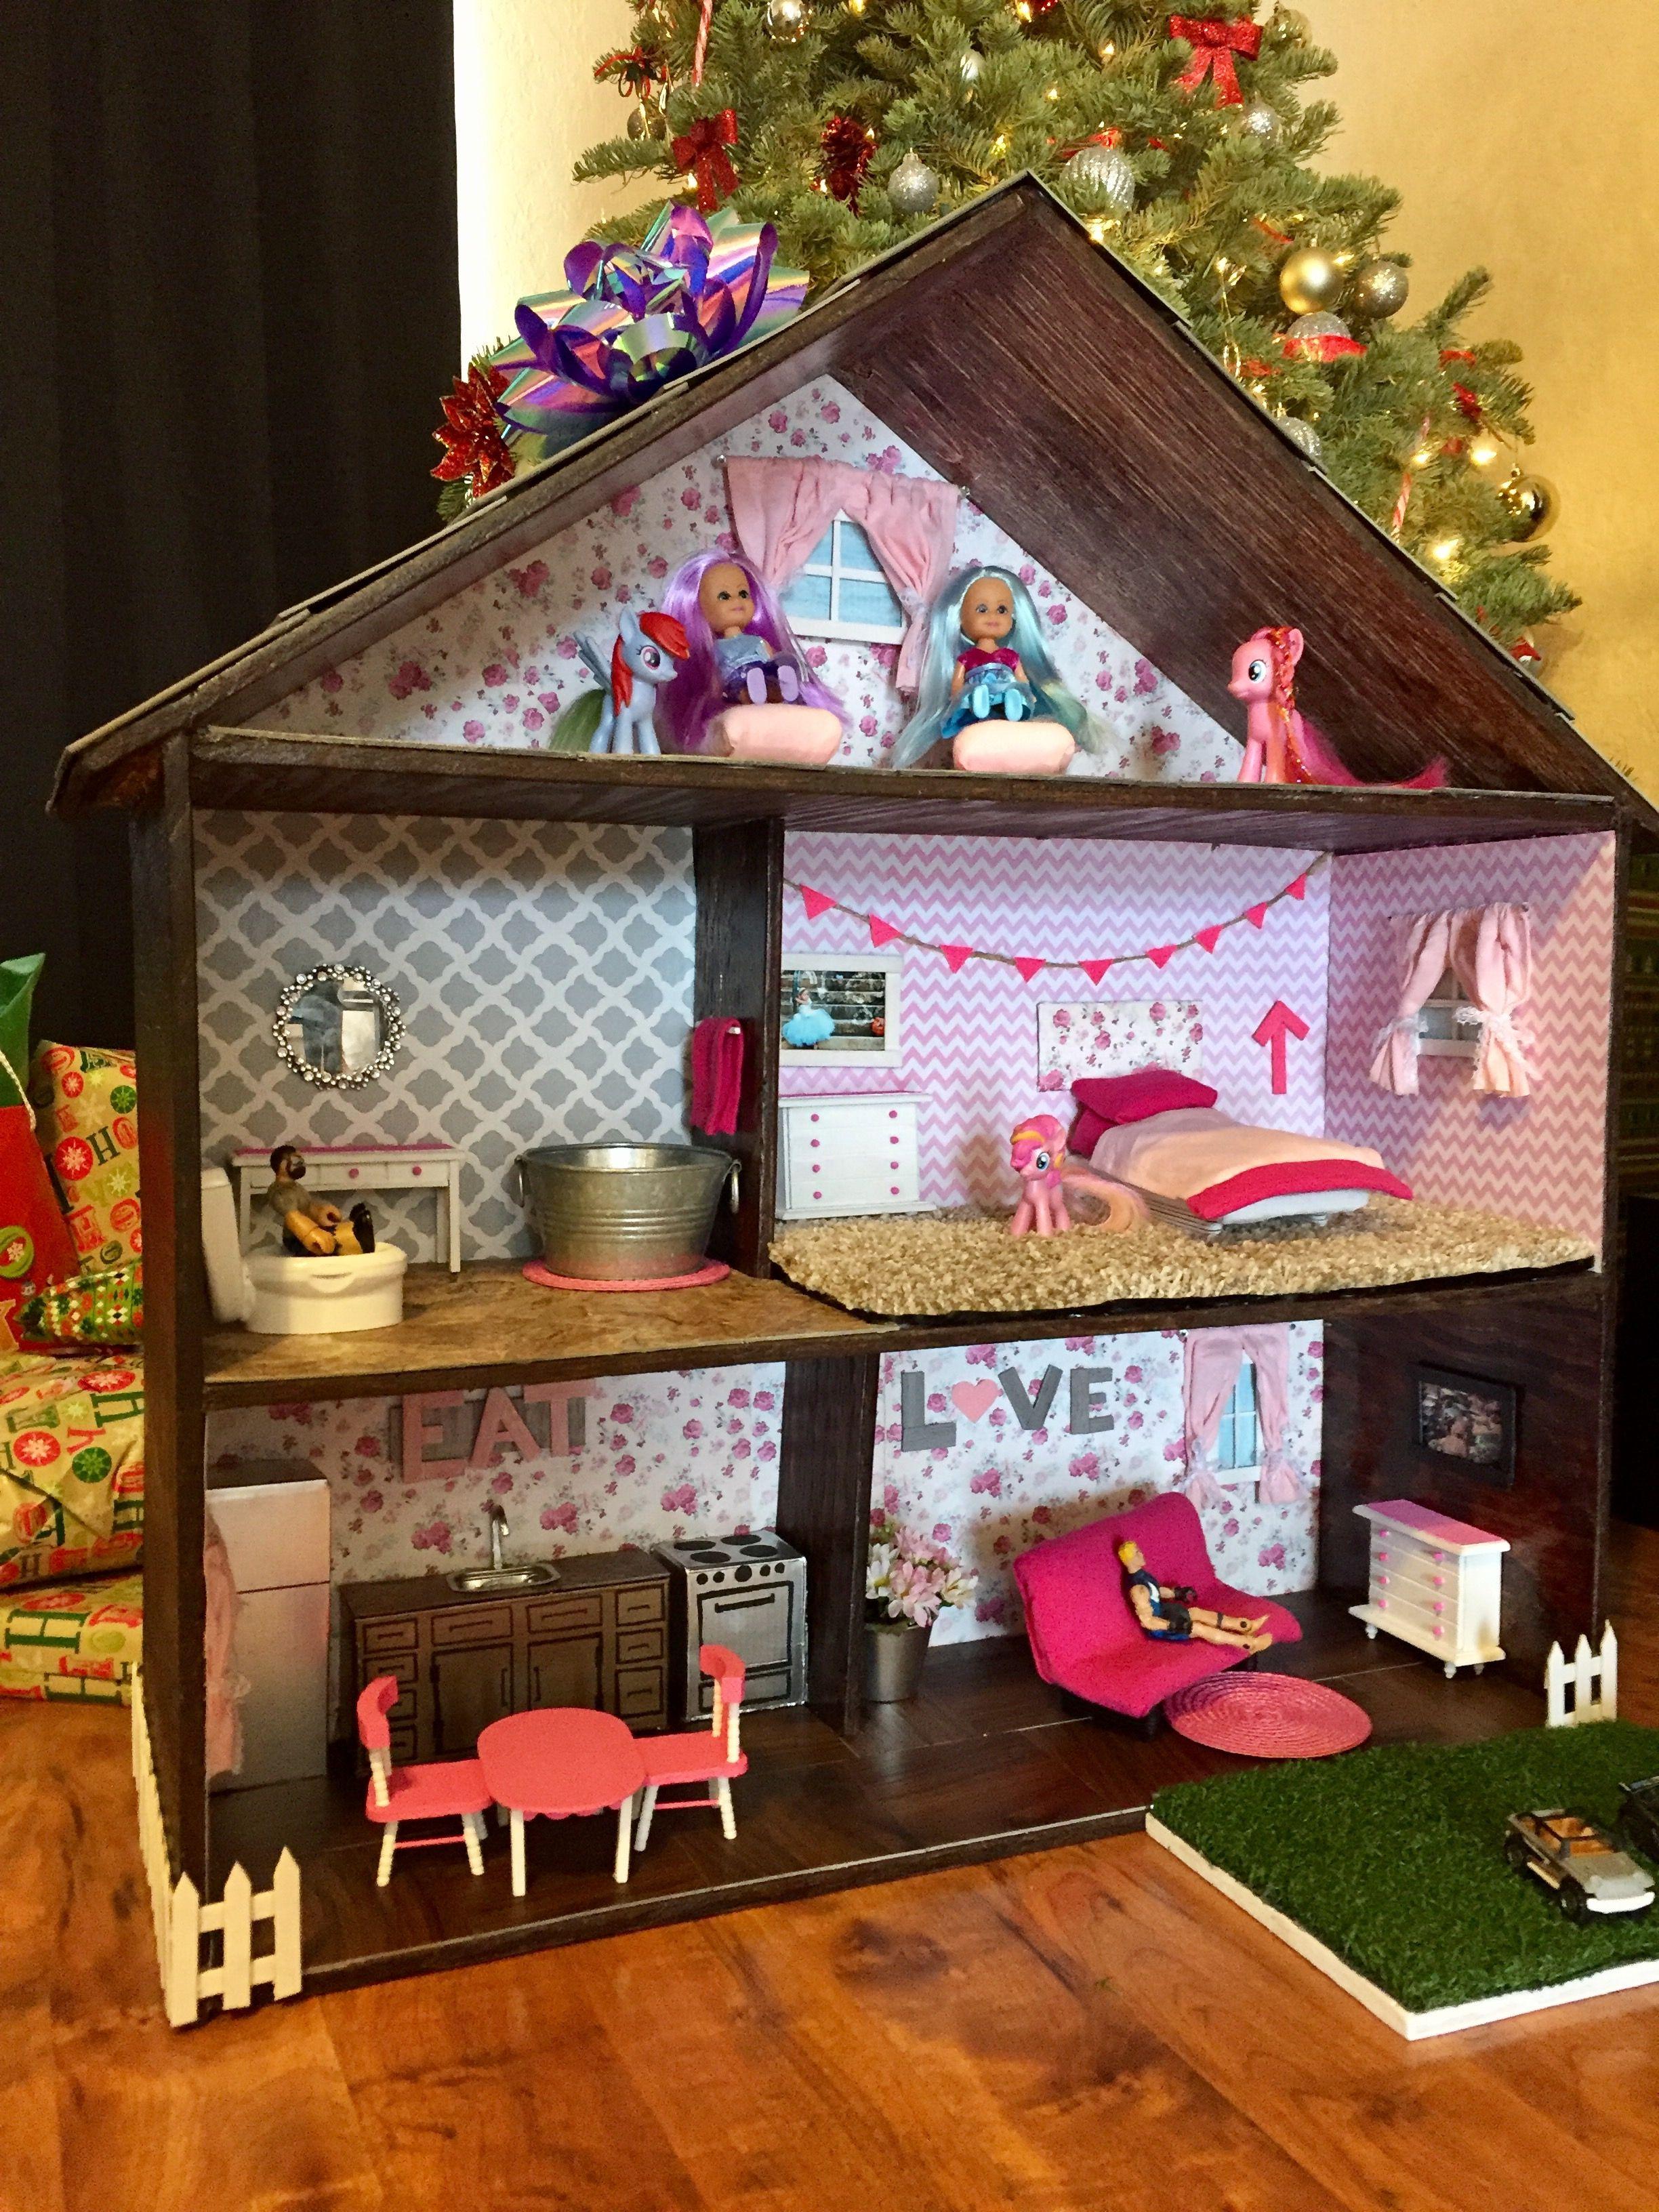 Homemade DIY dollhouse. Under 40 Home Depot samples